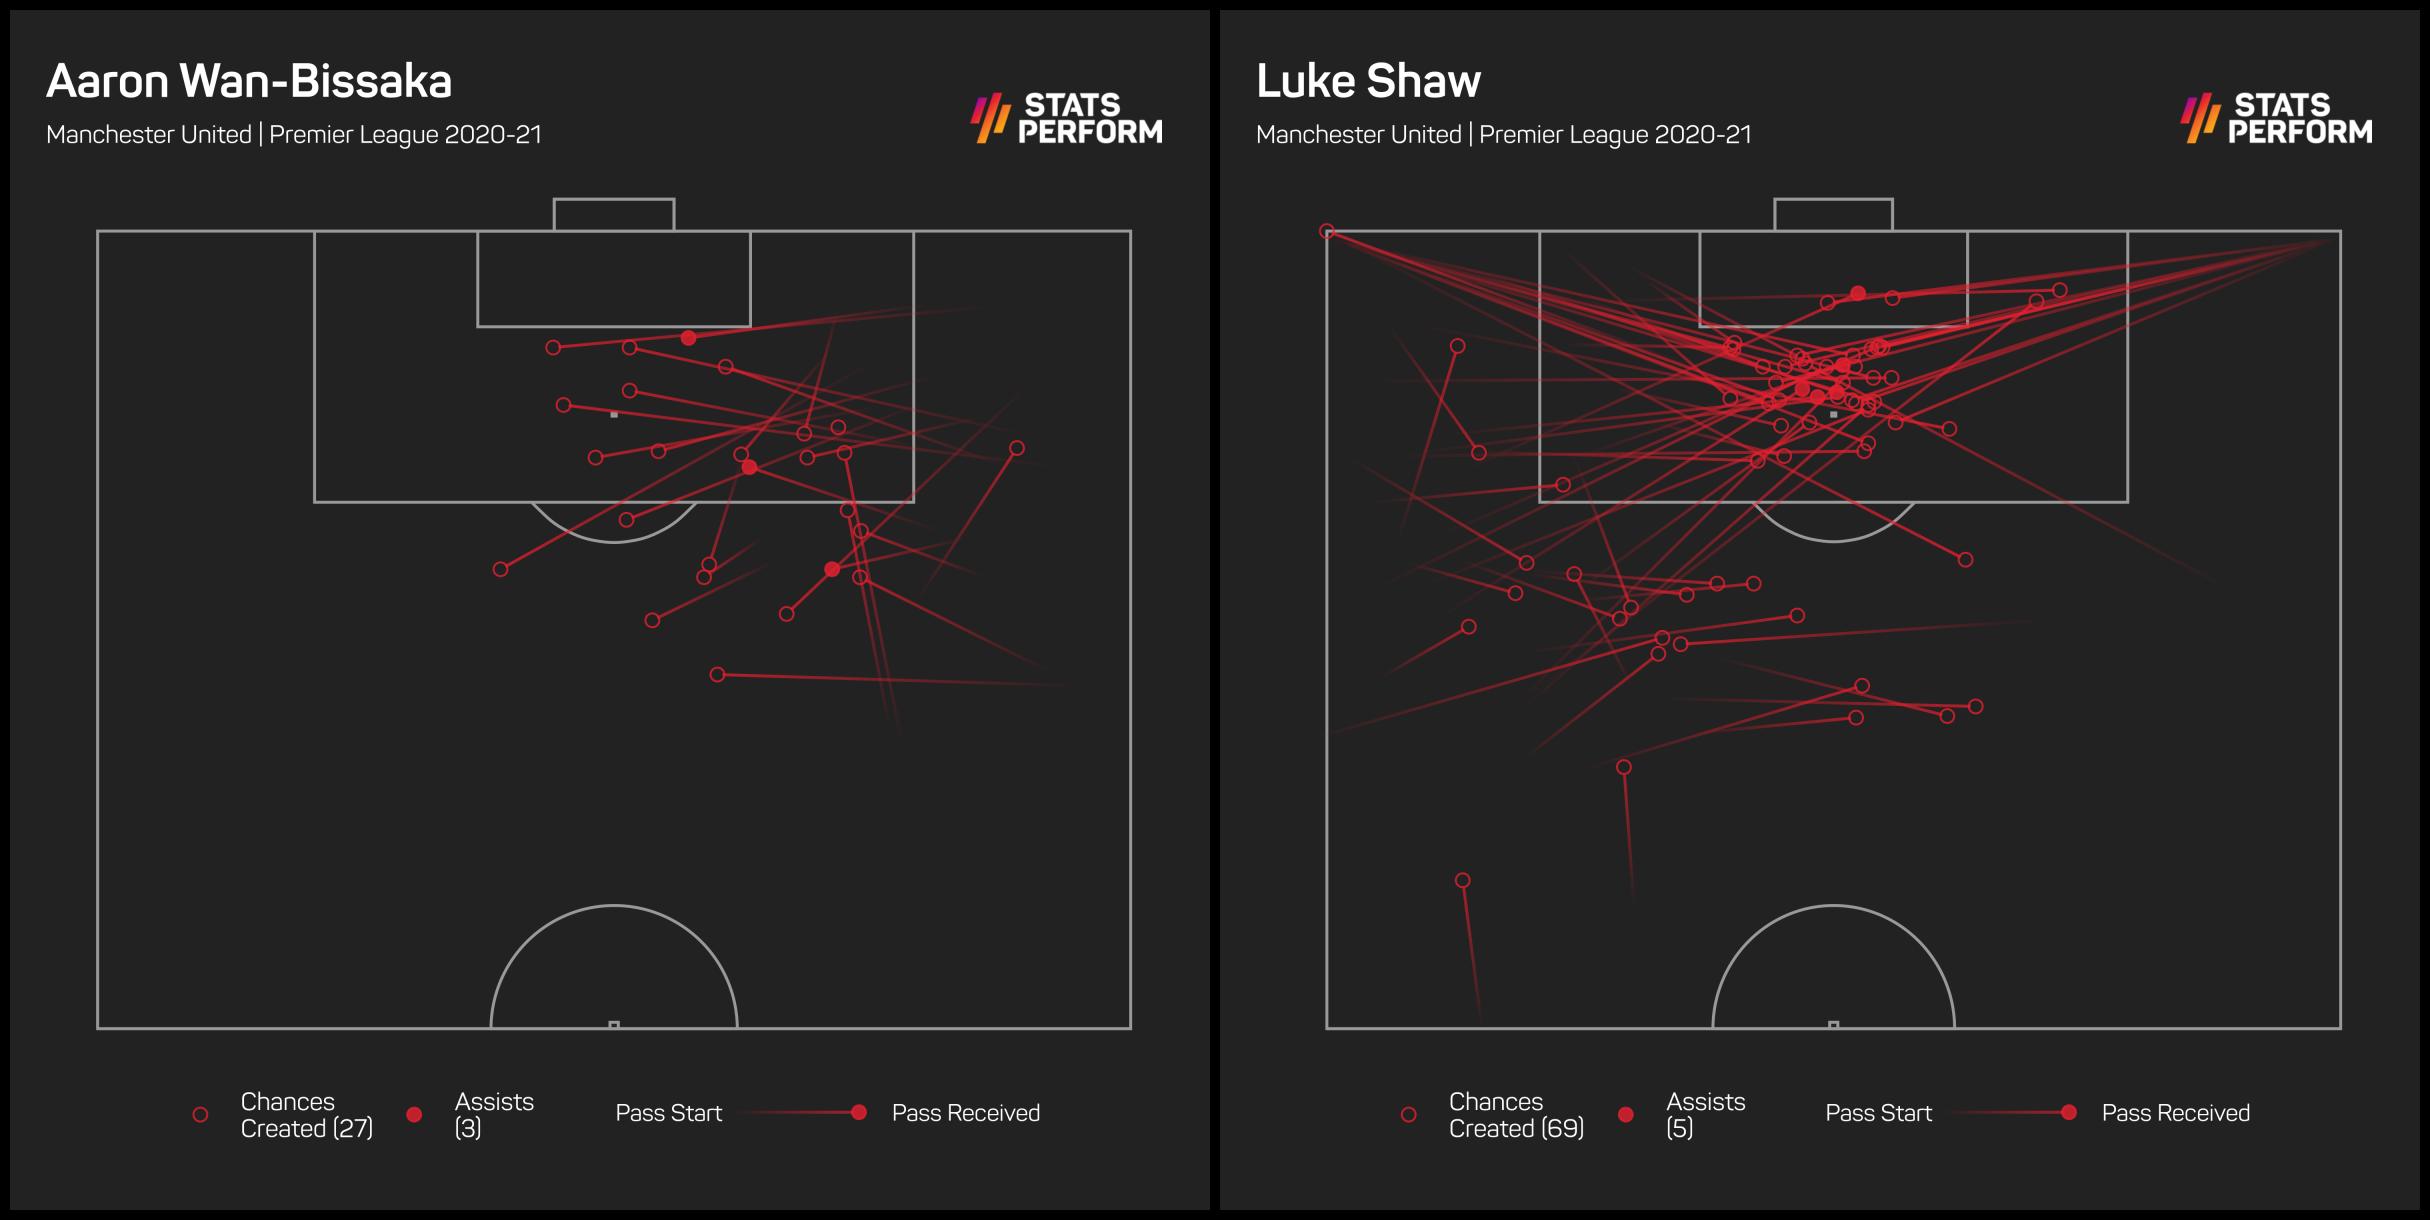 Luke Shaw is a greater creative threat than Aaron Wan-Bissaka